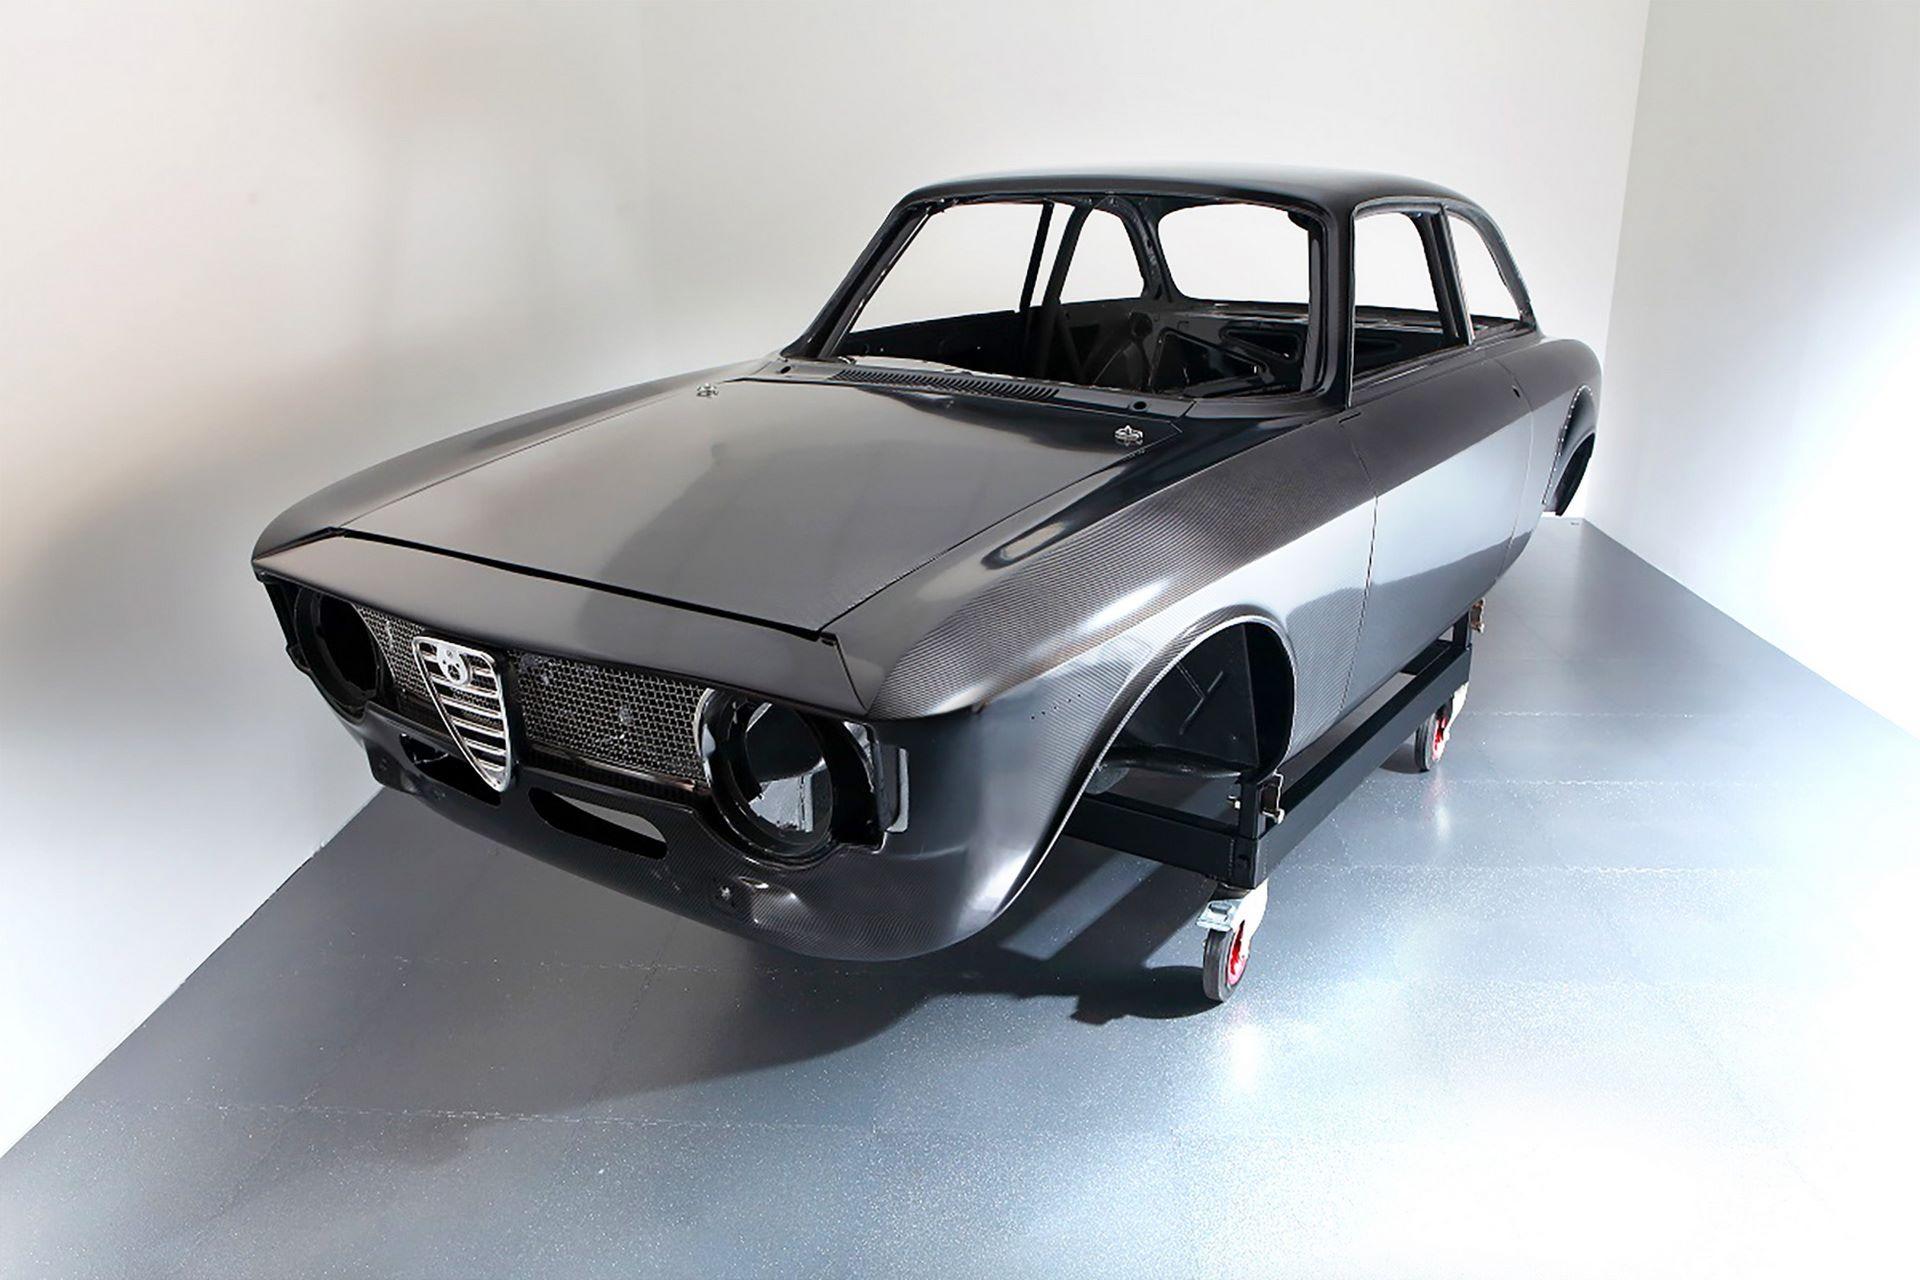 Carbon-Alfa-Romeo-Giulia-by-Alfaholics-2